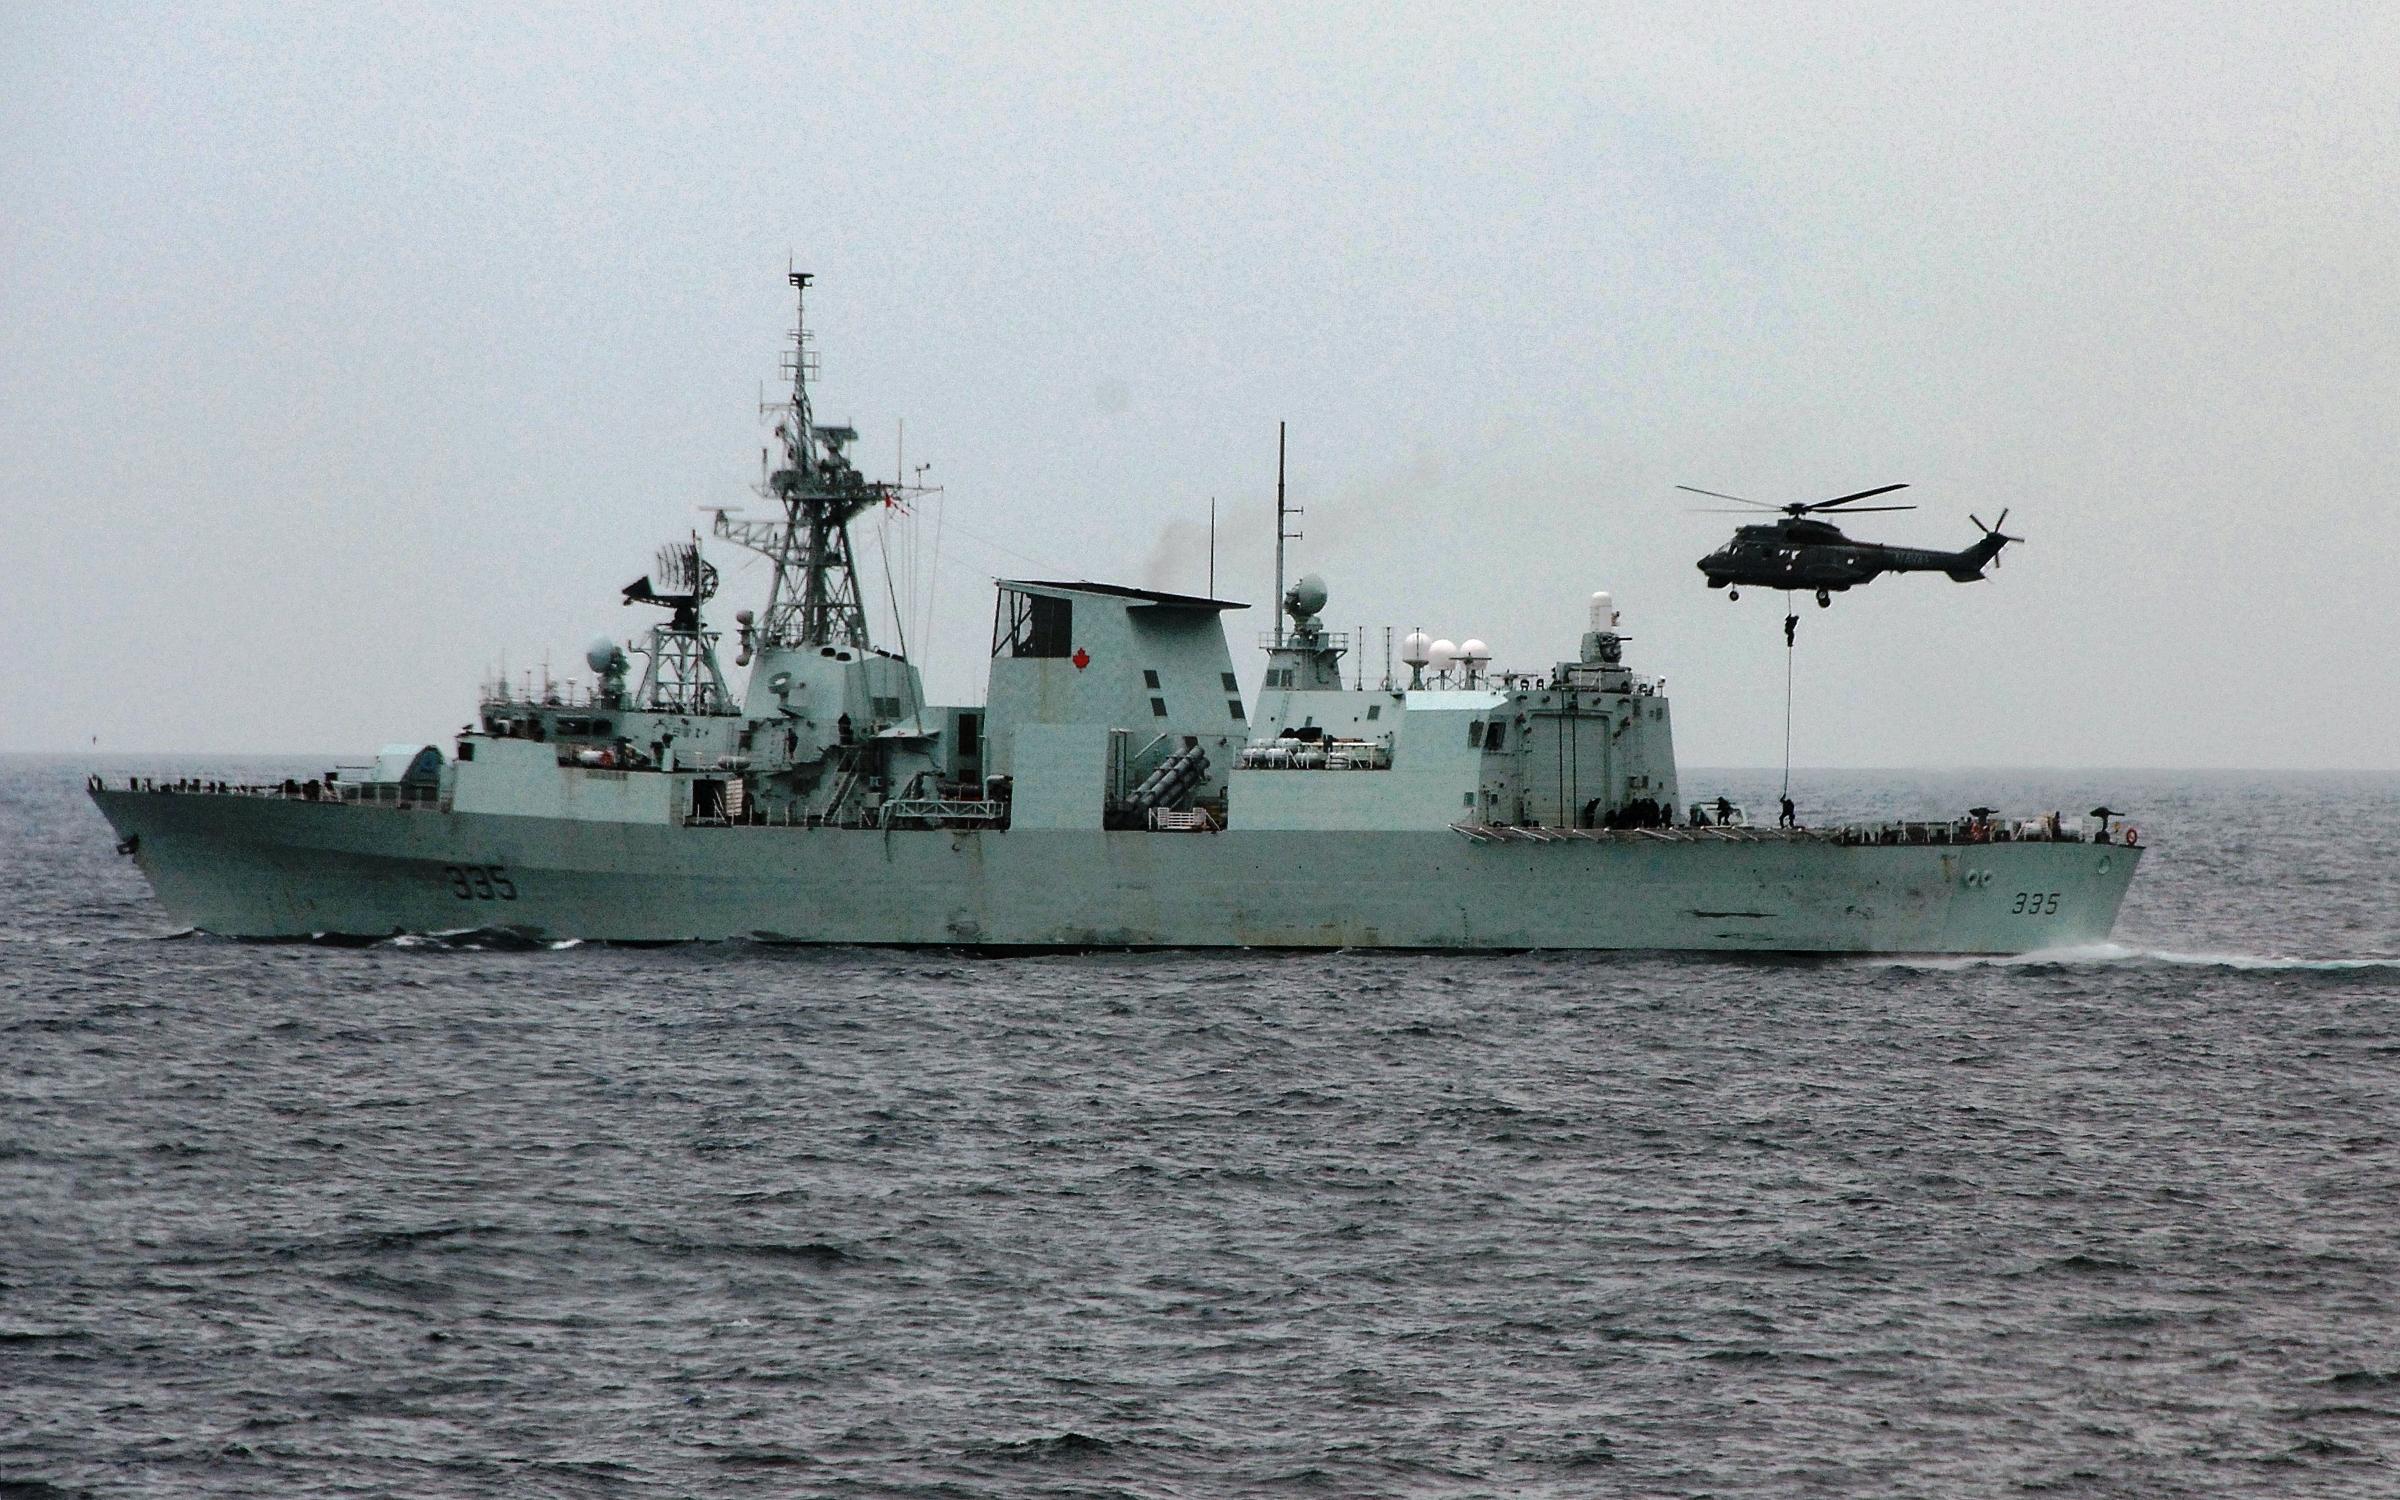 Descrizione canadian navy frigate hmcs calgary (ffh 335)